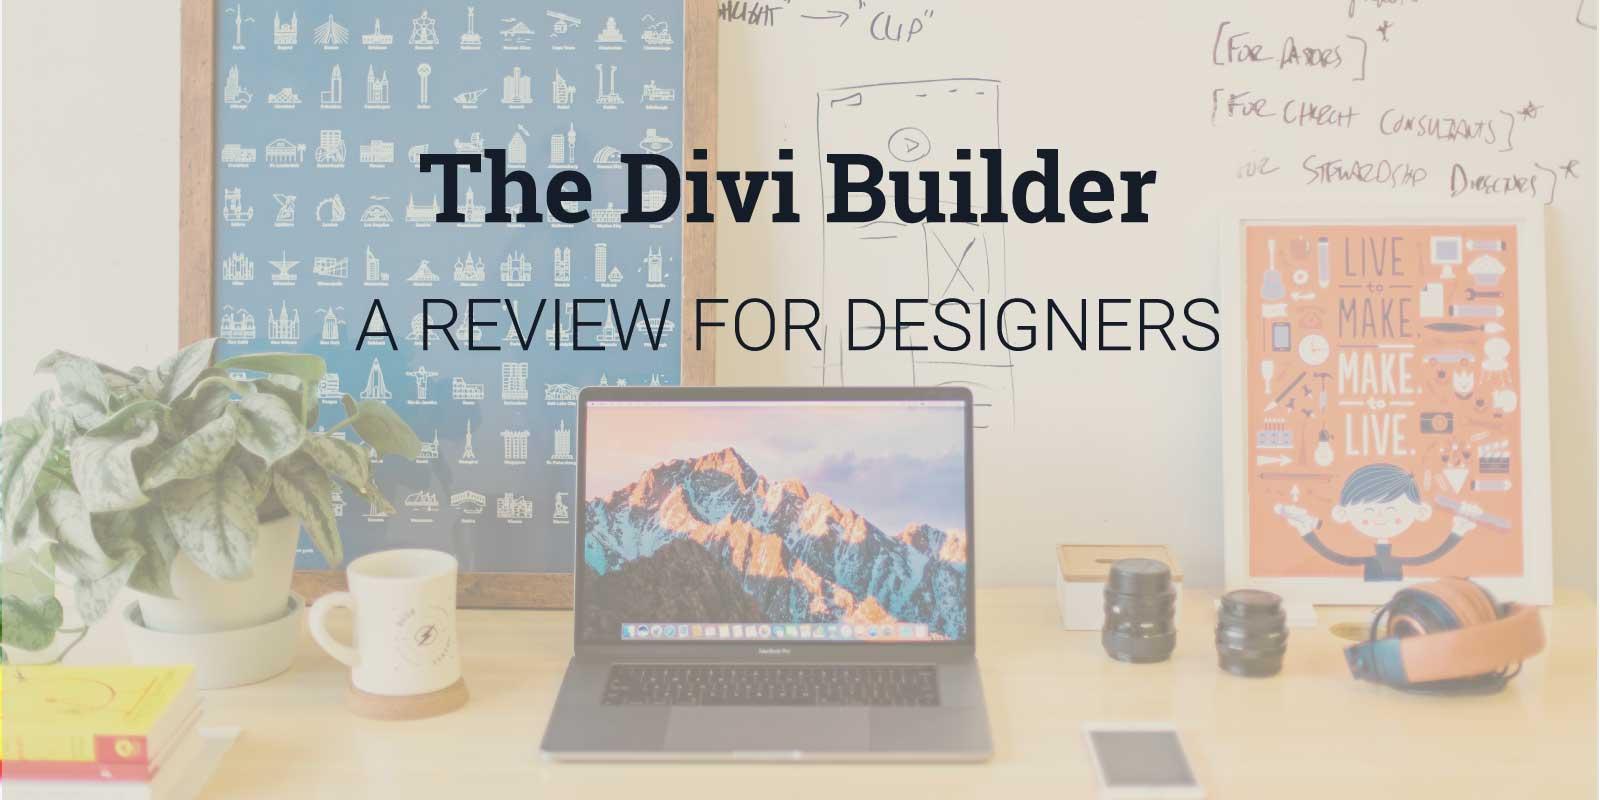 divi-builder-design-review.jpg